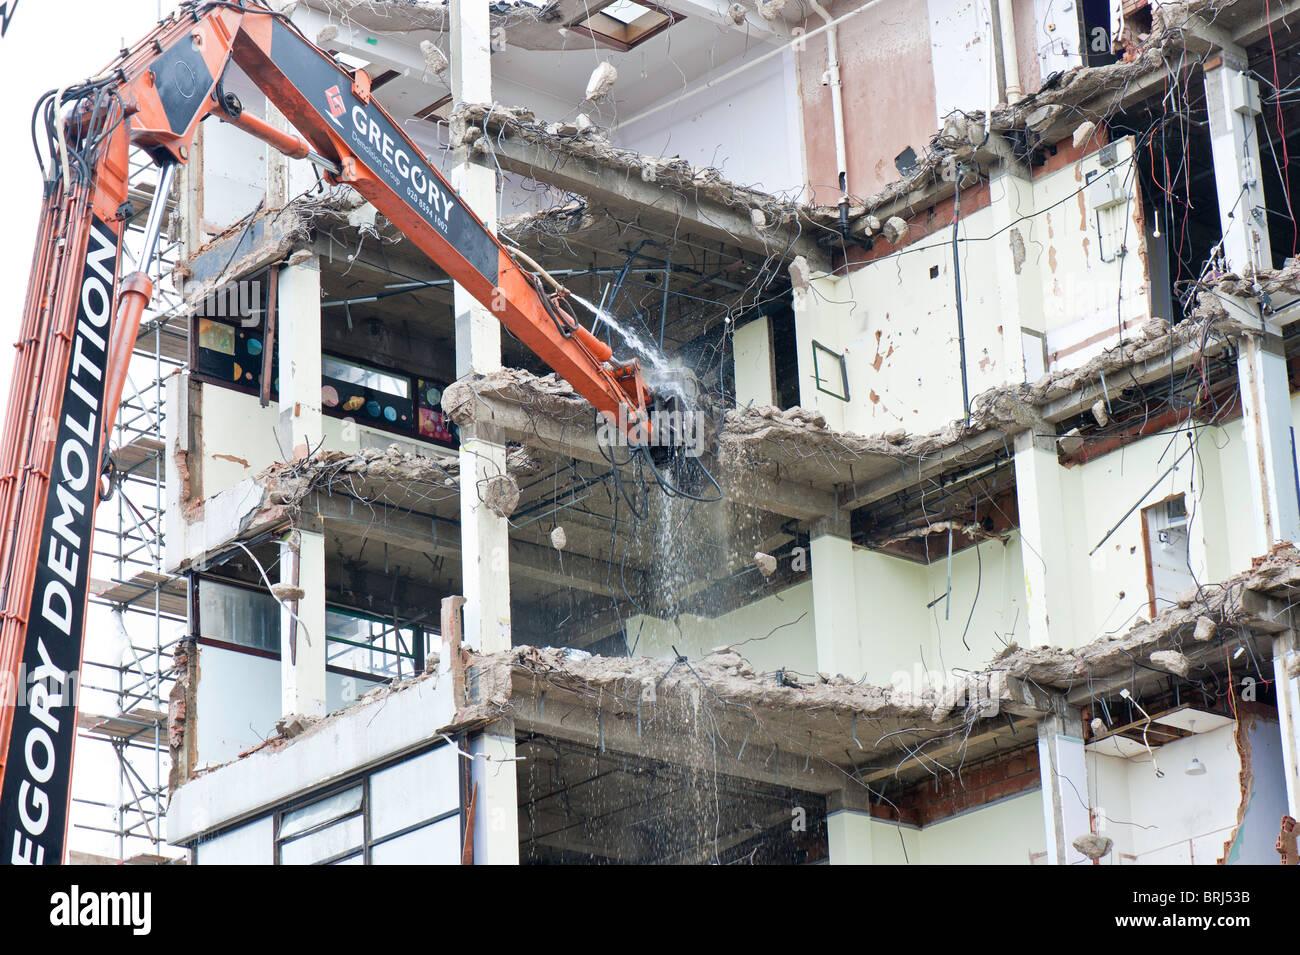 Building being demolished in Islington, N1, London, United Kingdom - Stock Image